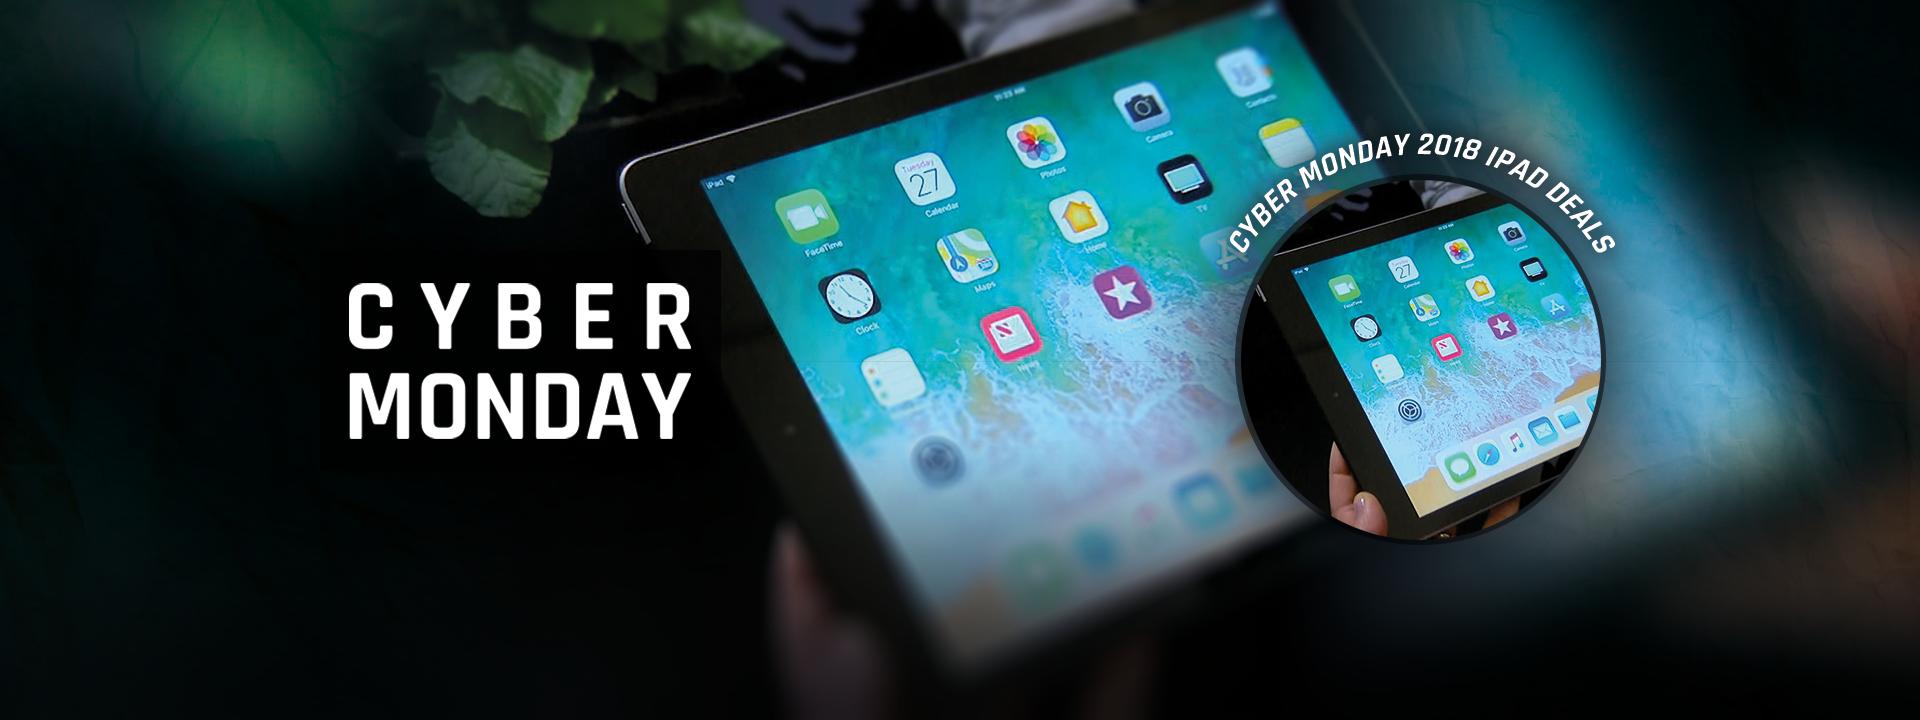 Best Cyber Monday 2018 Apple Ipad Deals Shacknews